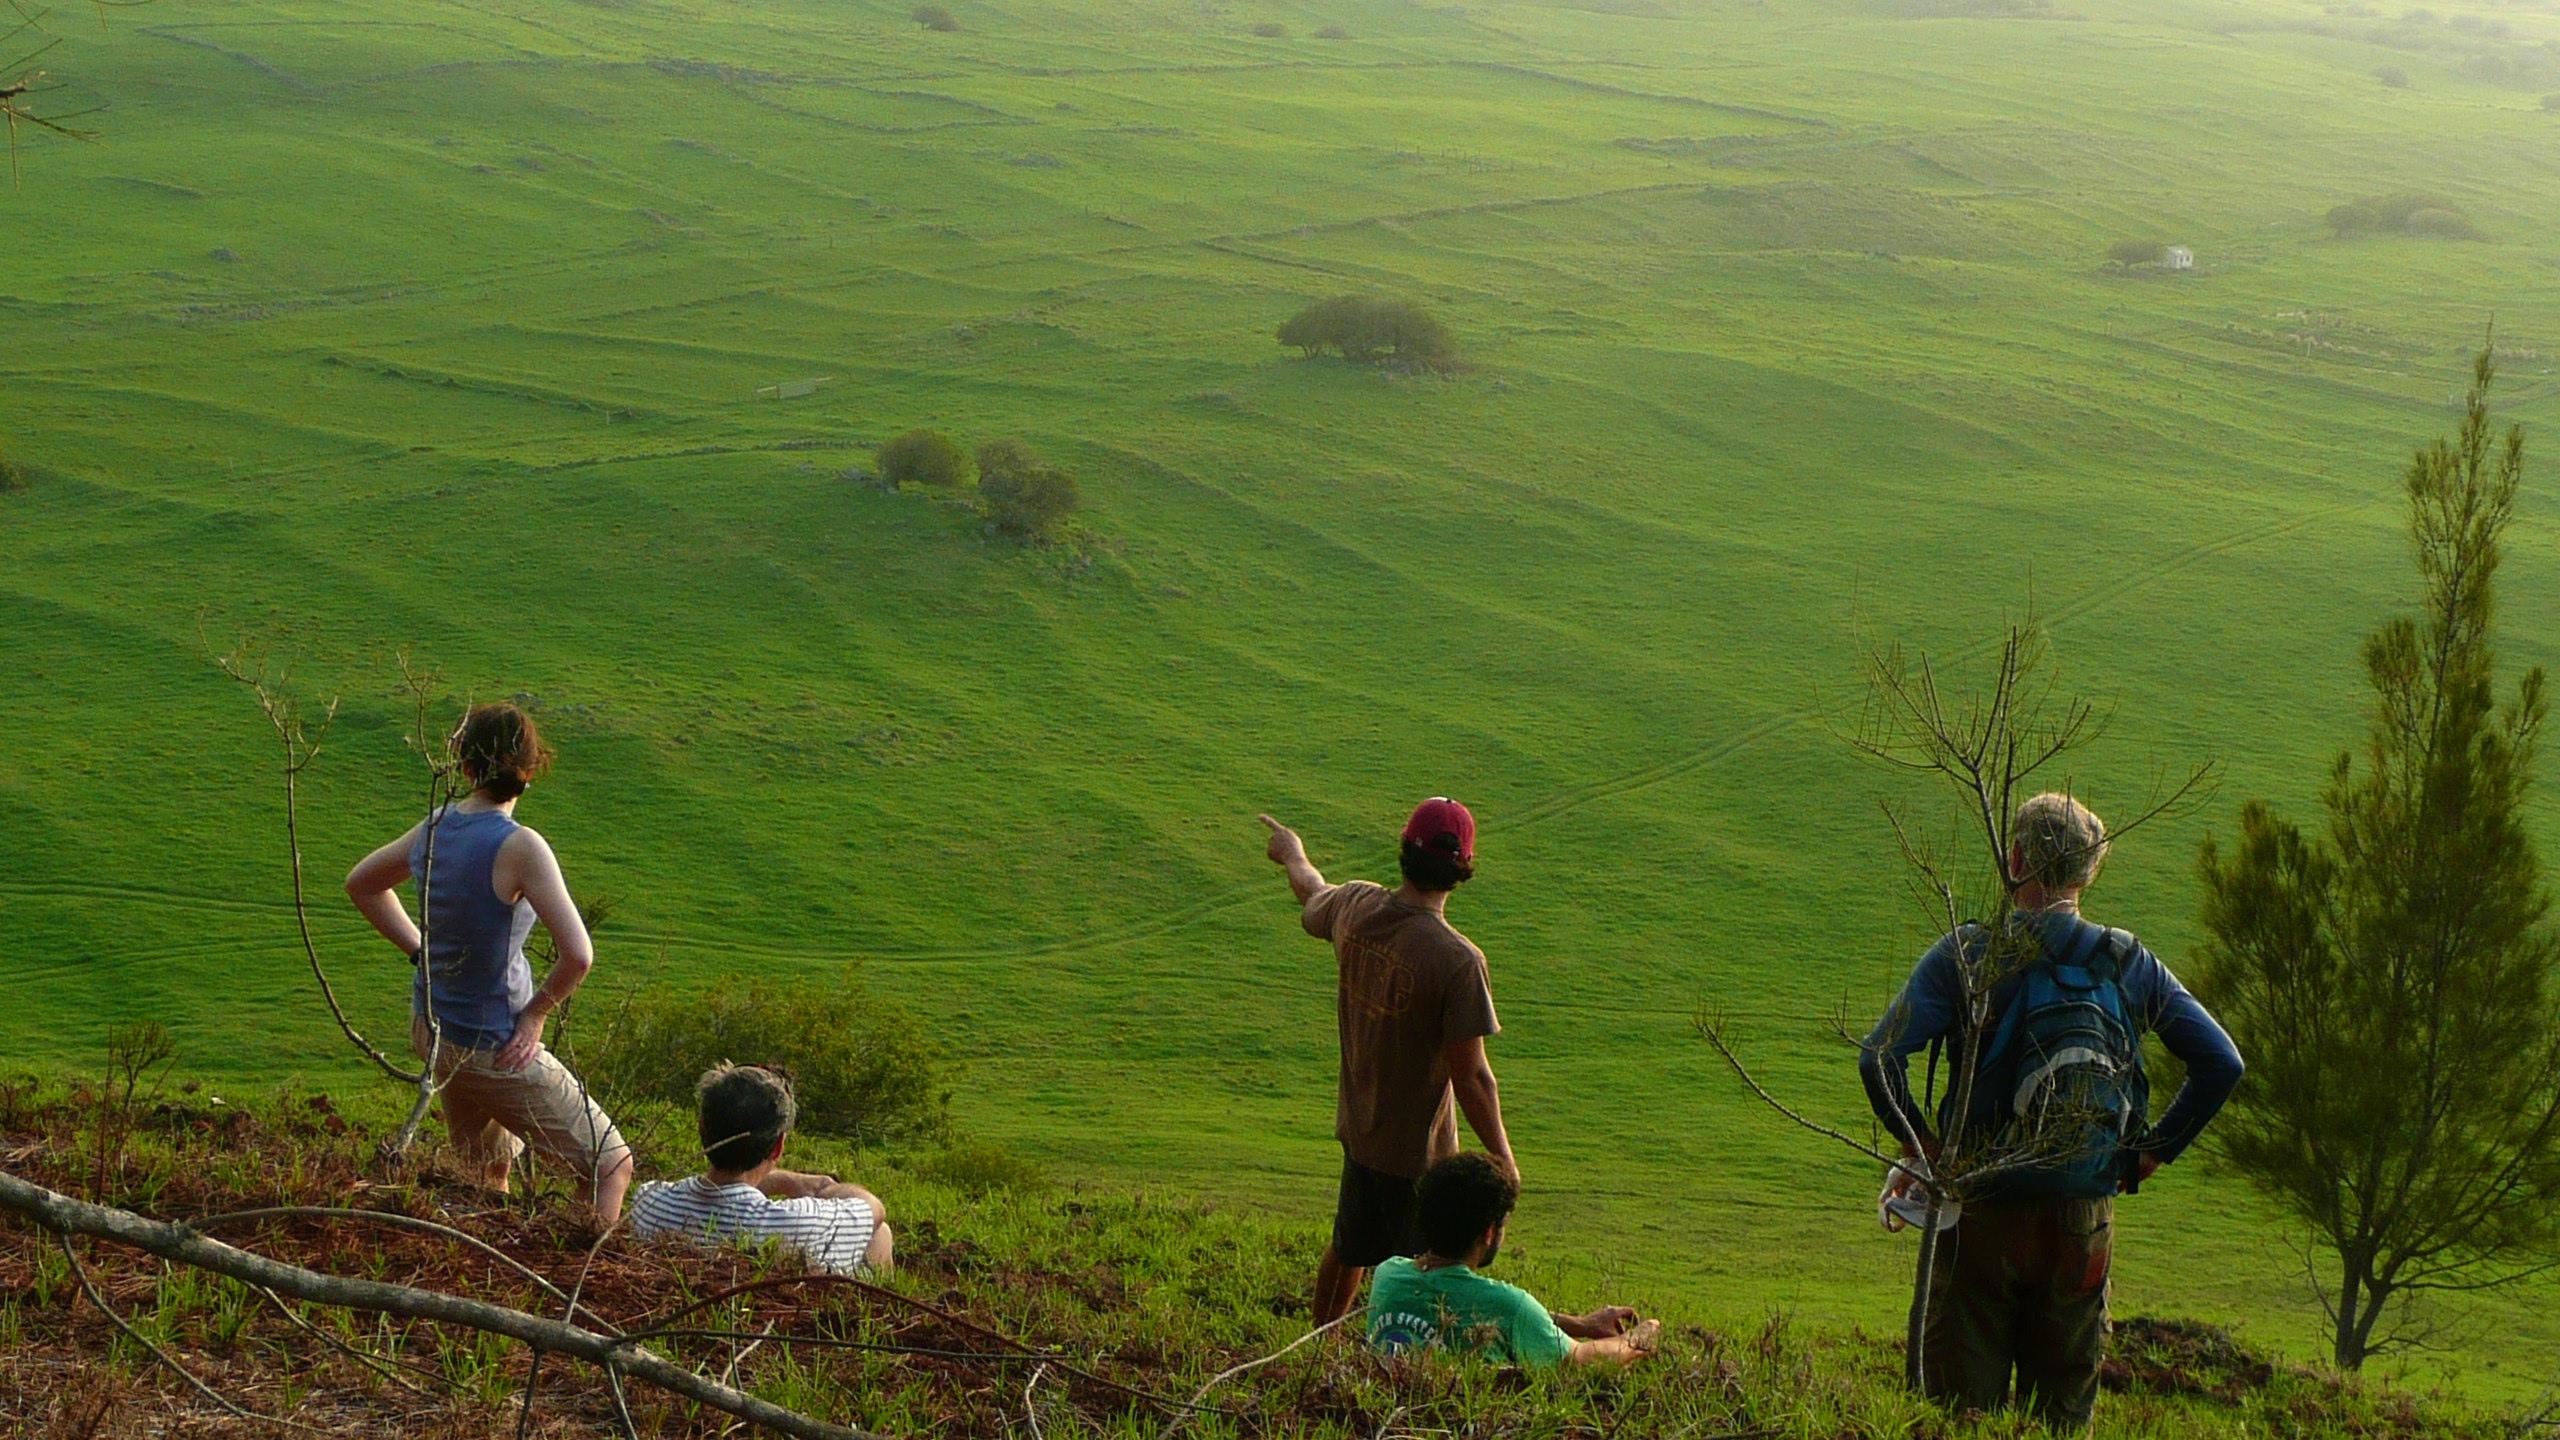 [Kohala field system] Photo by Noa Kekuewa Lincoln.